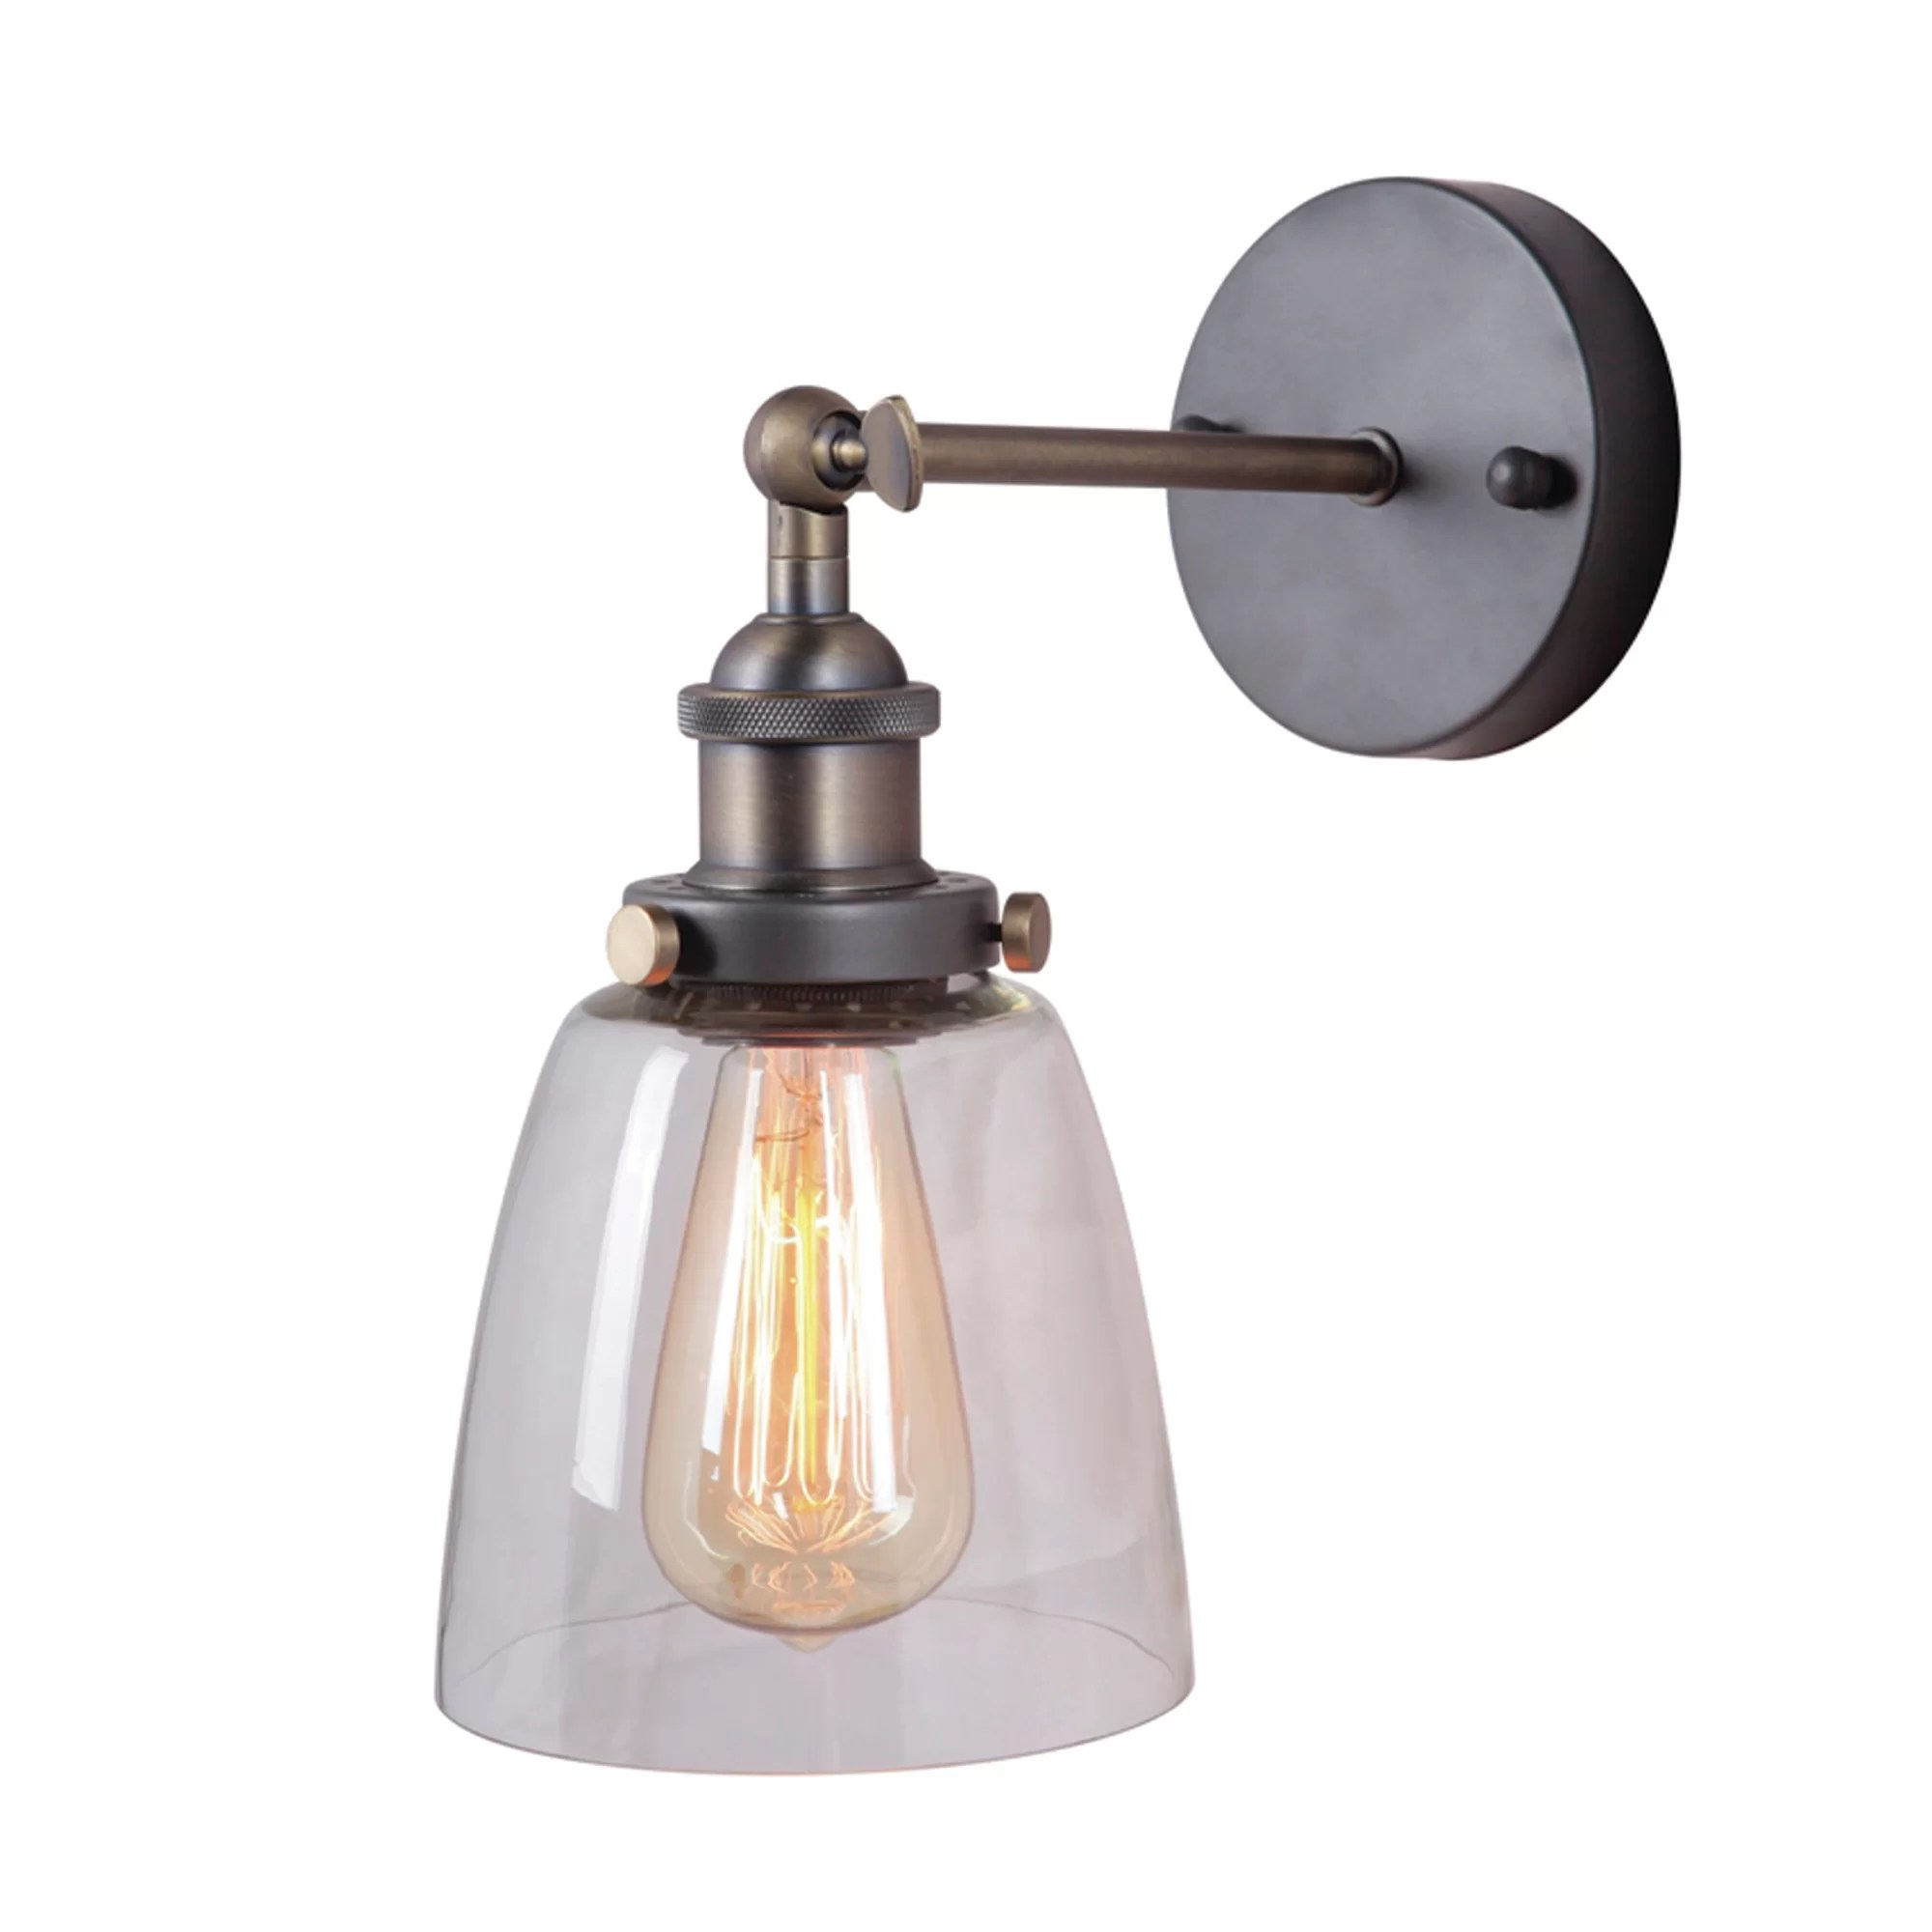 Yosemite Home Decor 1 Light Wall Sconce & Reviews | Wayfair on Wall Sconce Lighting Decor id=13990